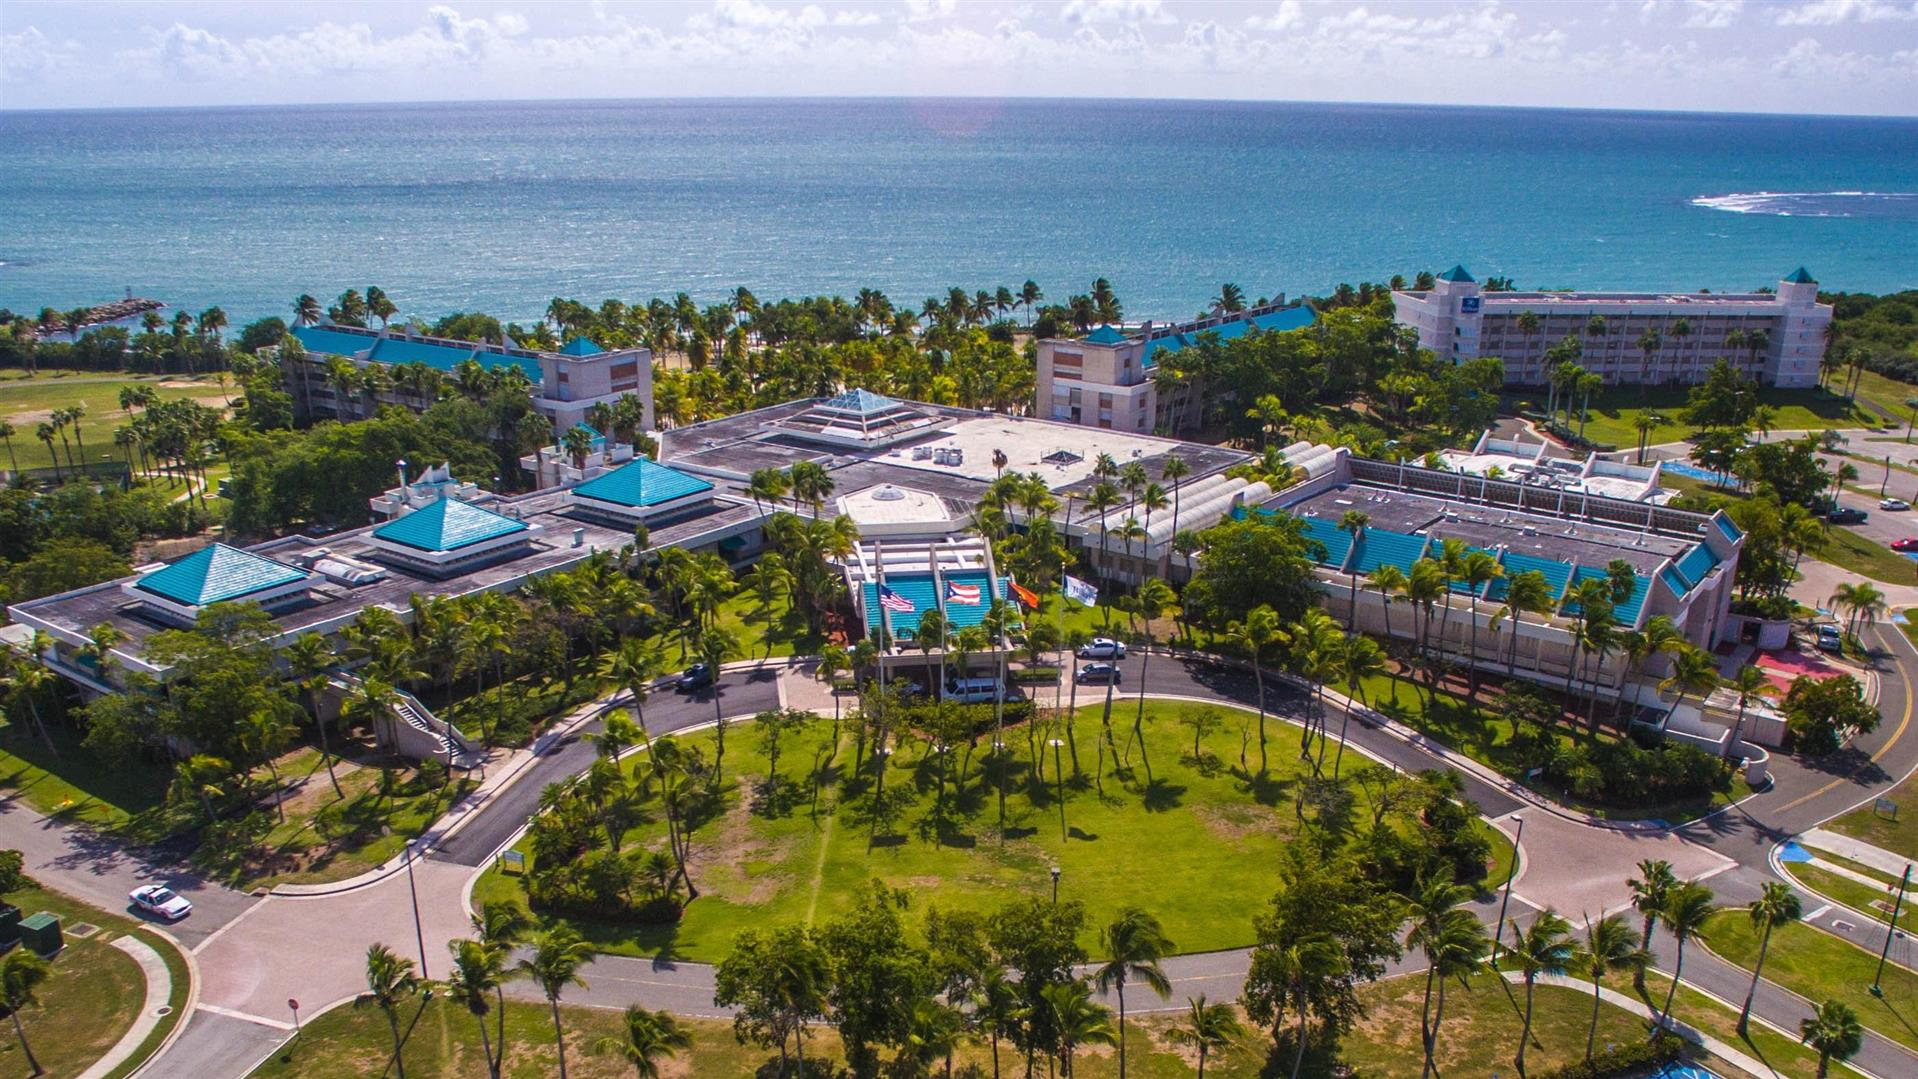 ponce golf and casino resort